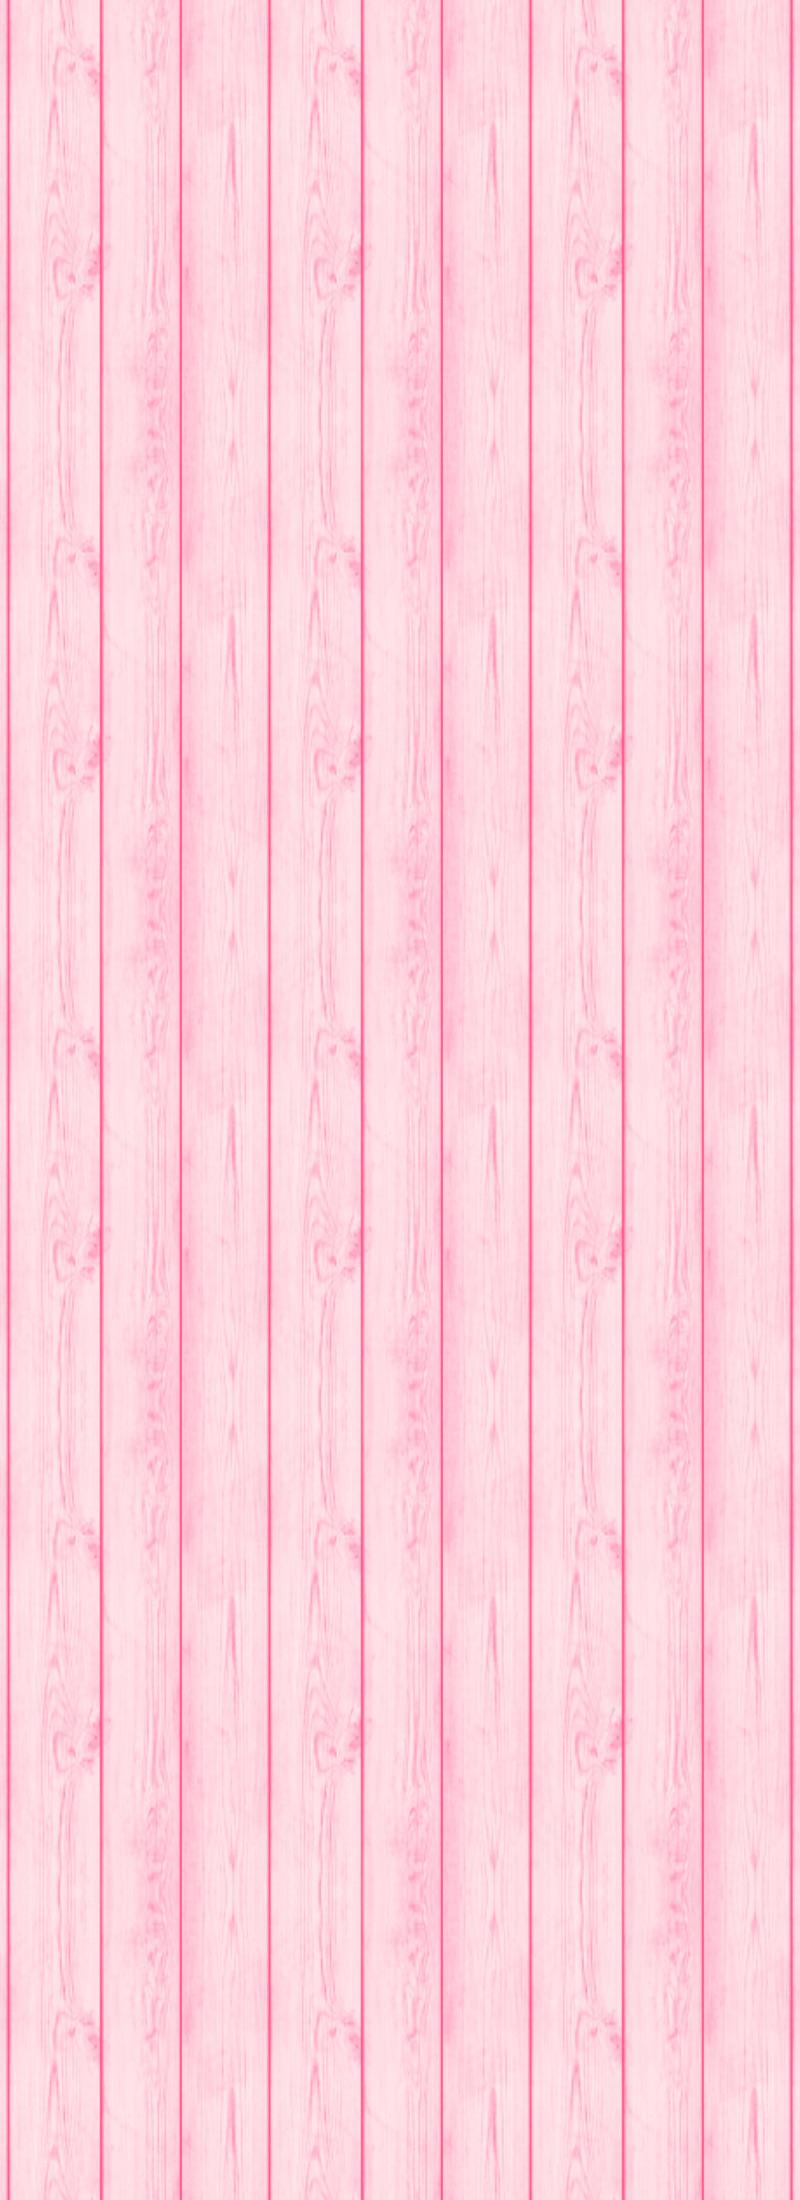 wooden door 2 custom box background by cre8art4life on deviantart. Black Bedroom Furniture Sets. Home Design Ideas